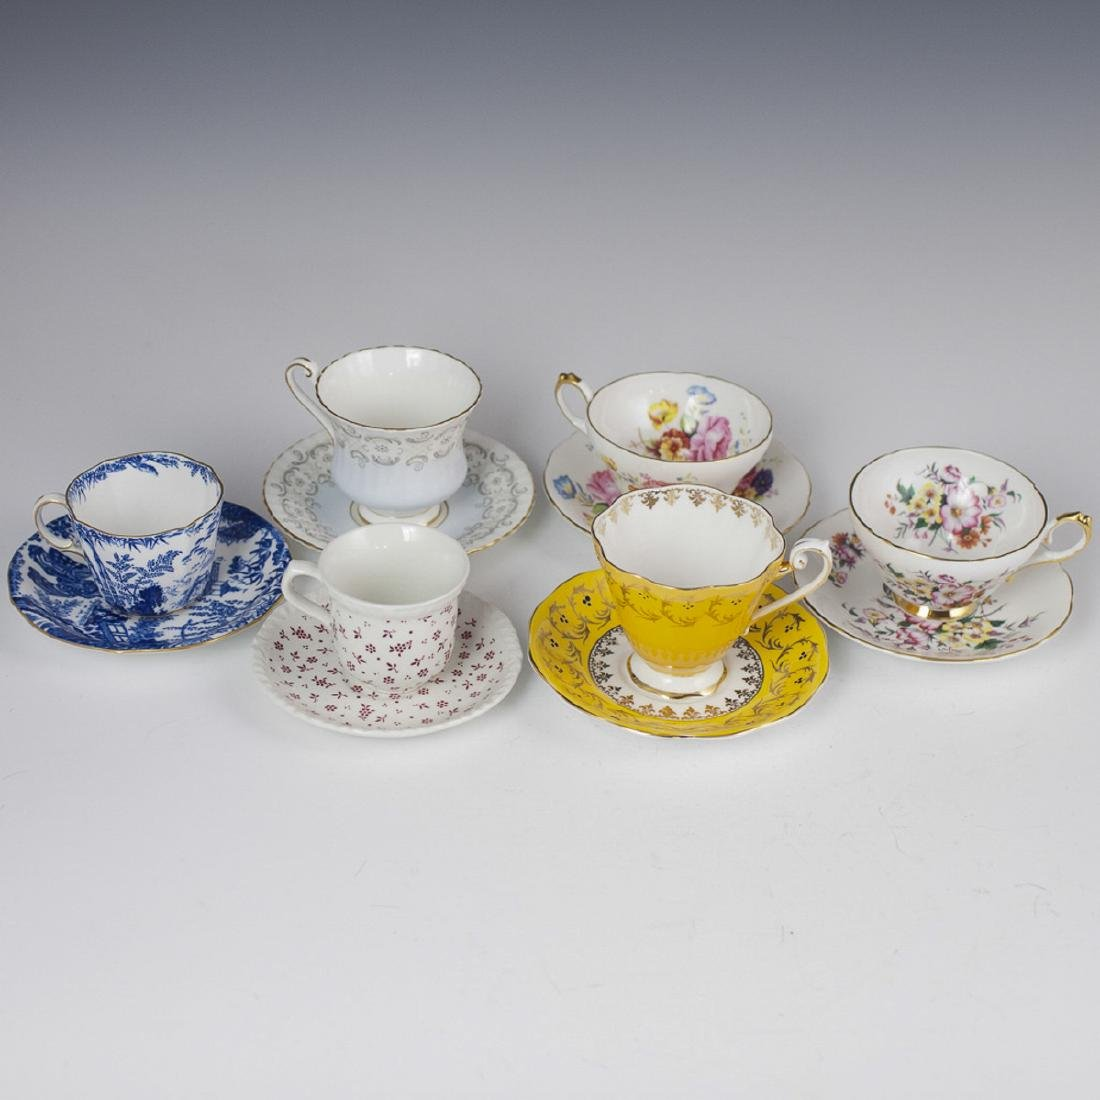 English Porcelain Tea Cups